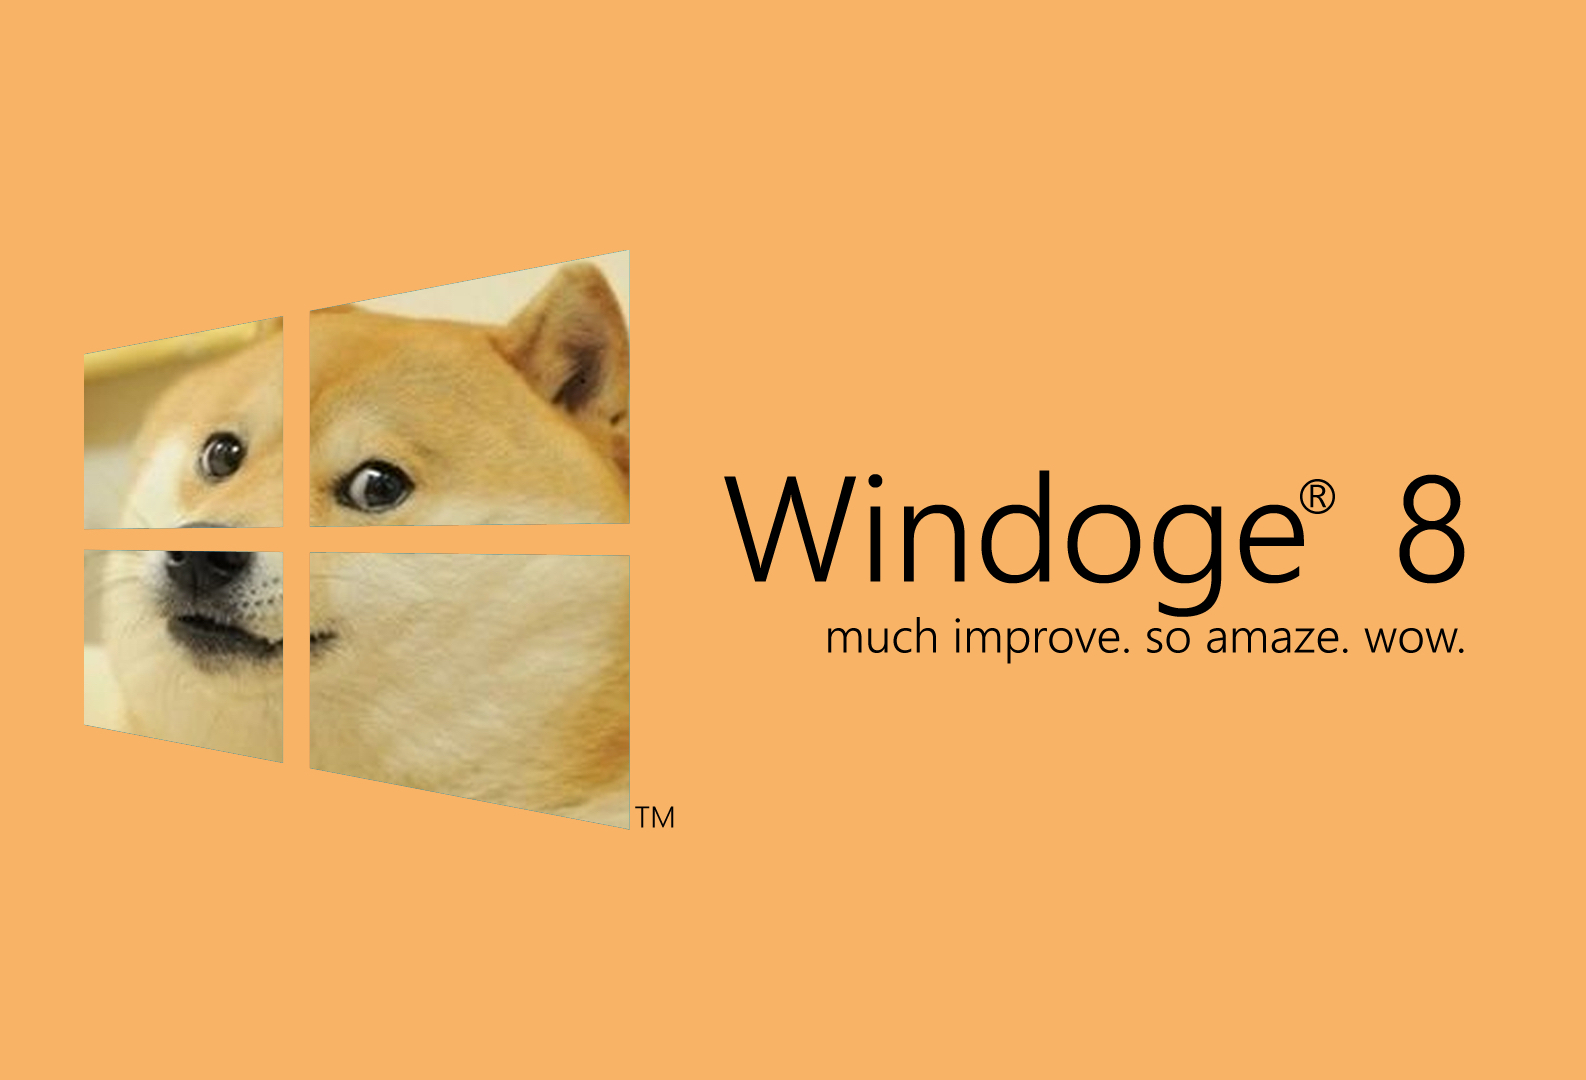 Windoge 10 * - meme